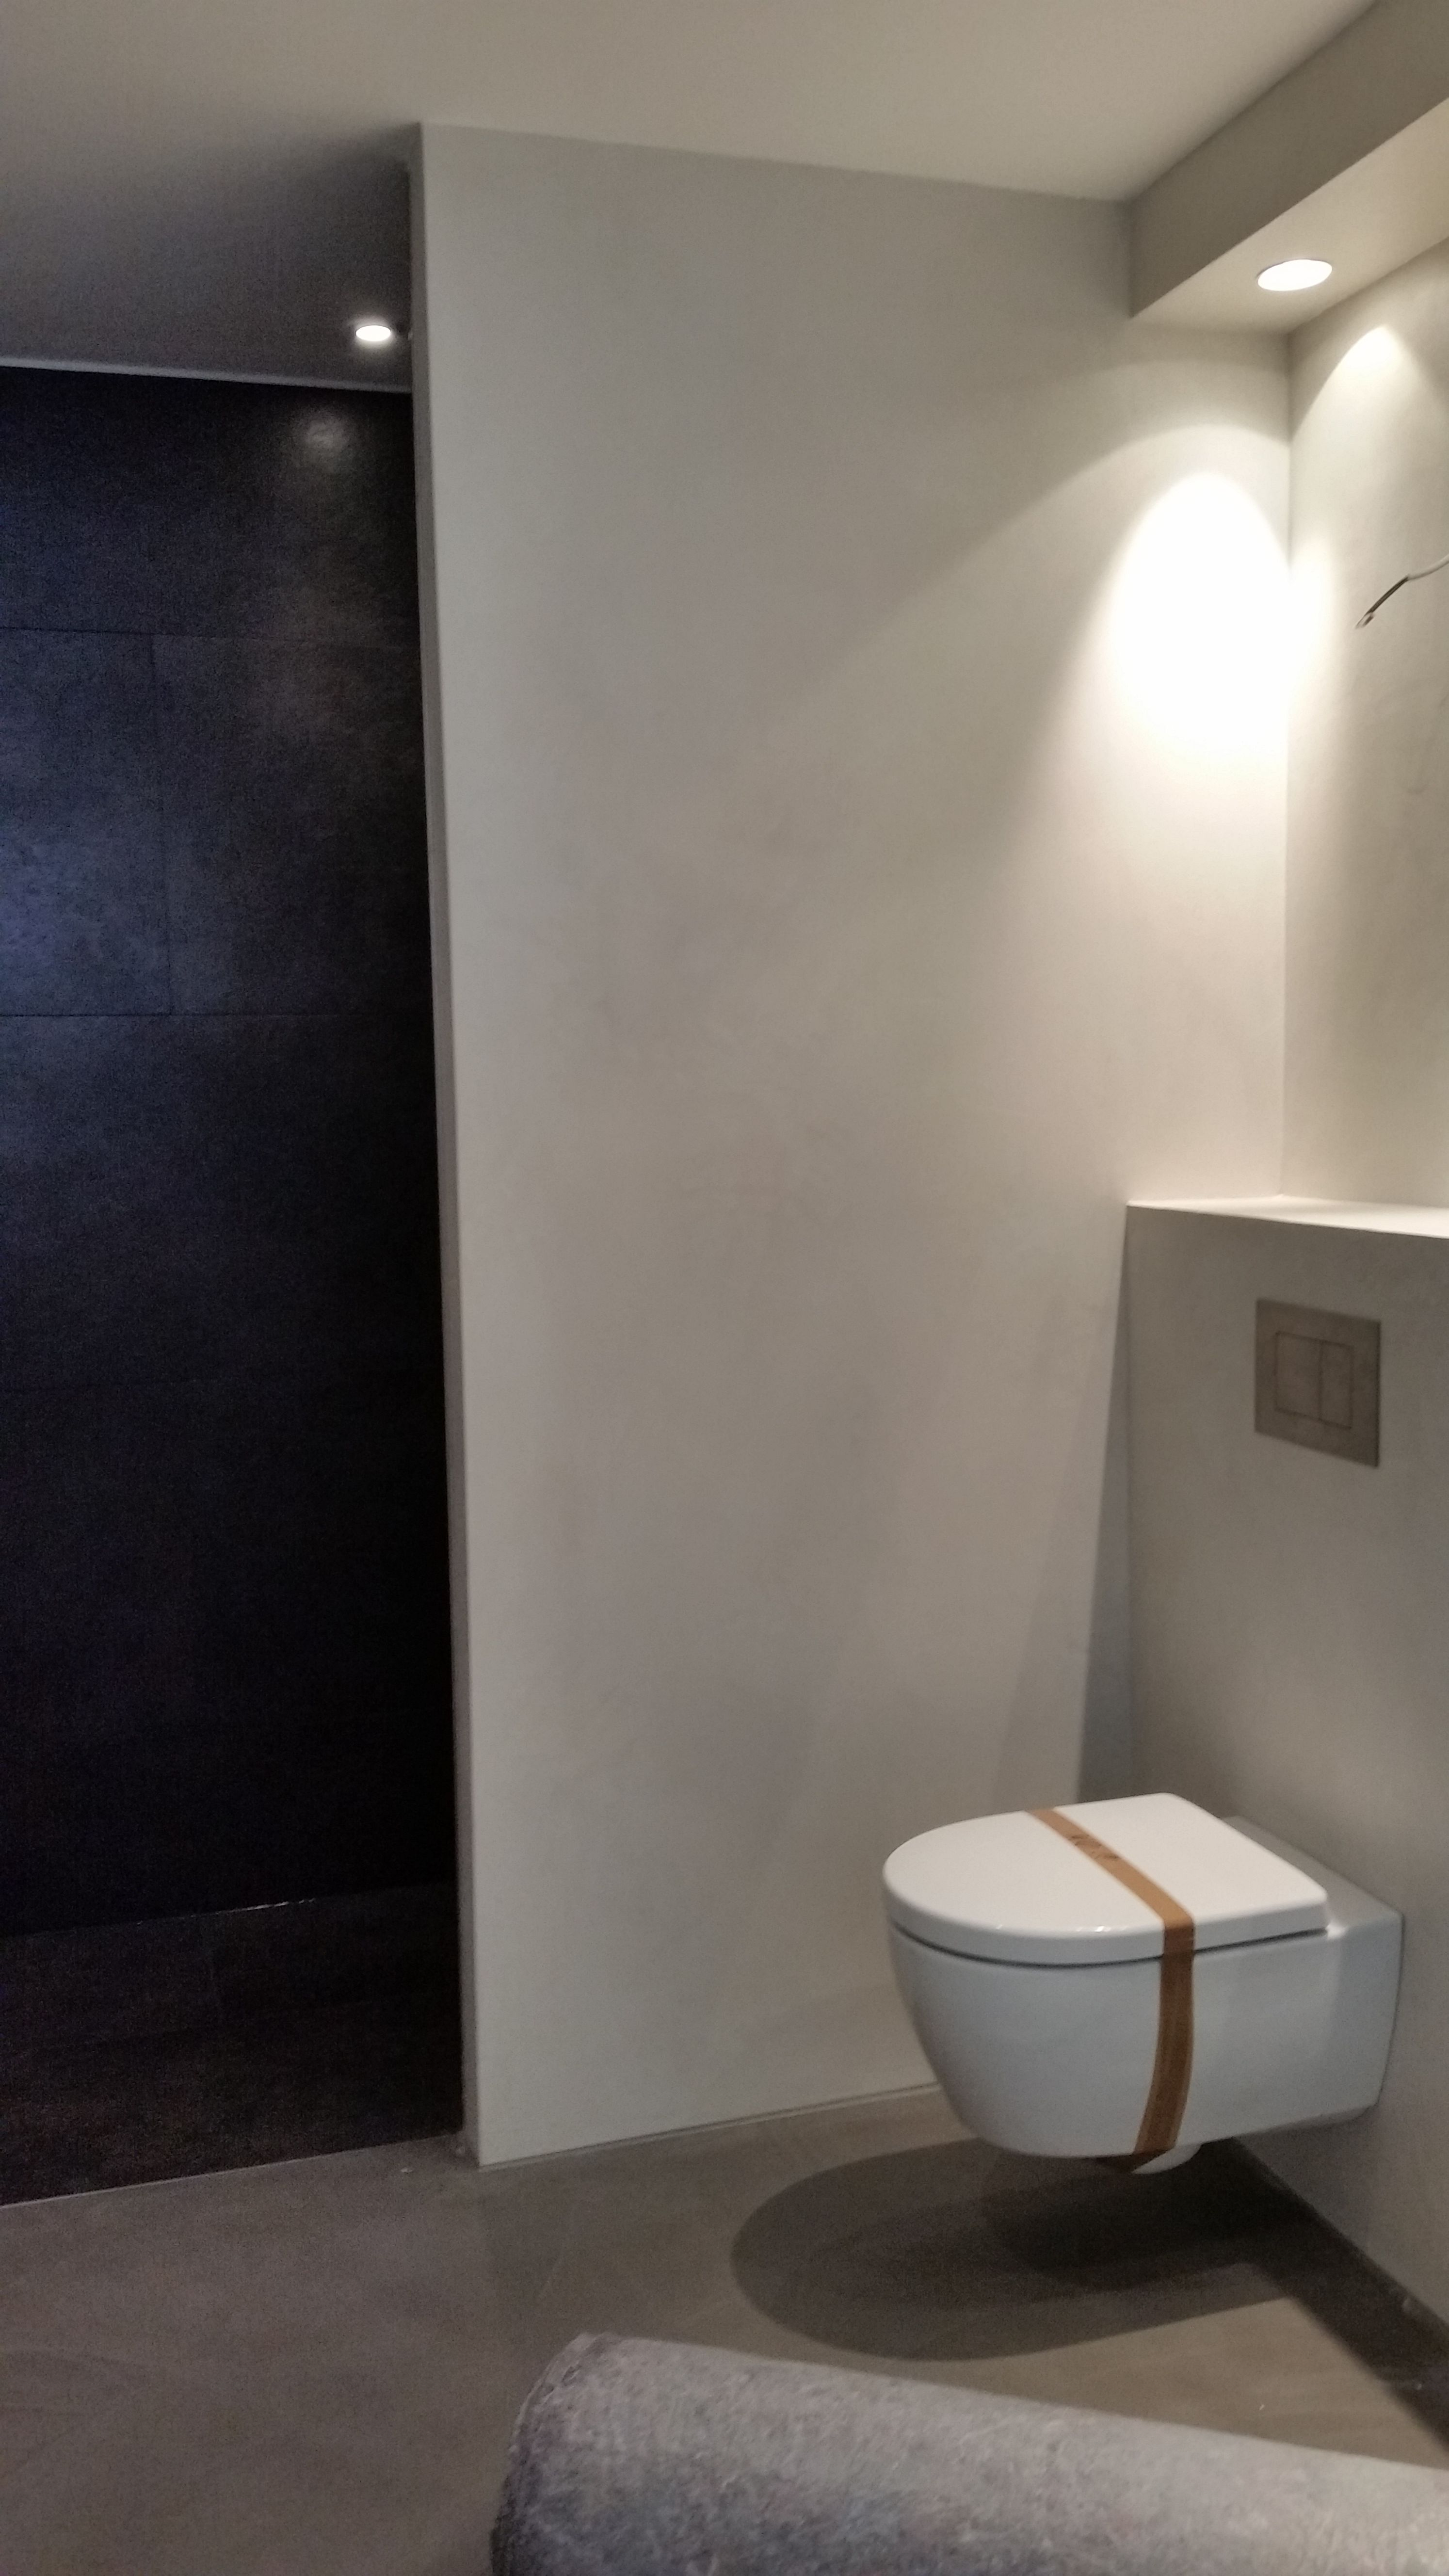 beton cire dusche erfahrungen wohn design. Black Bedroom Furniture Sets. Home Design Ideas